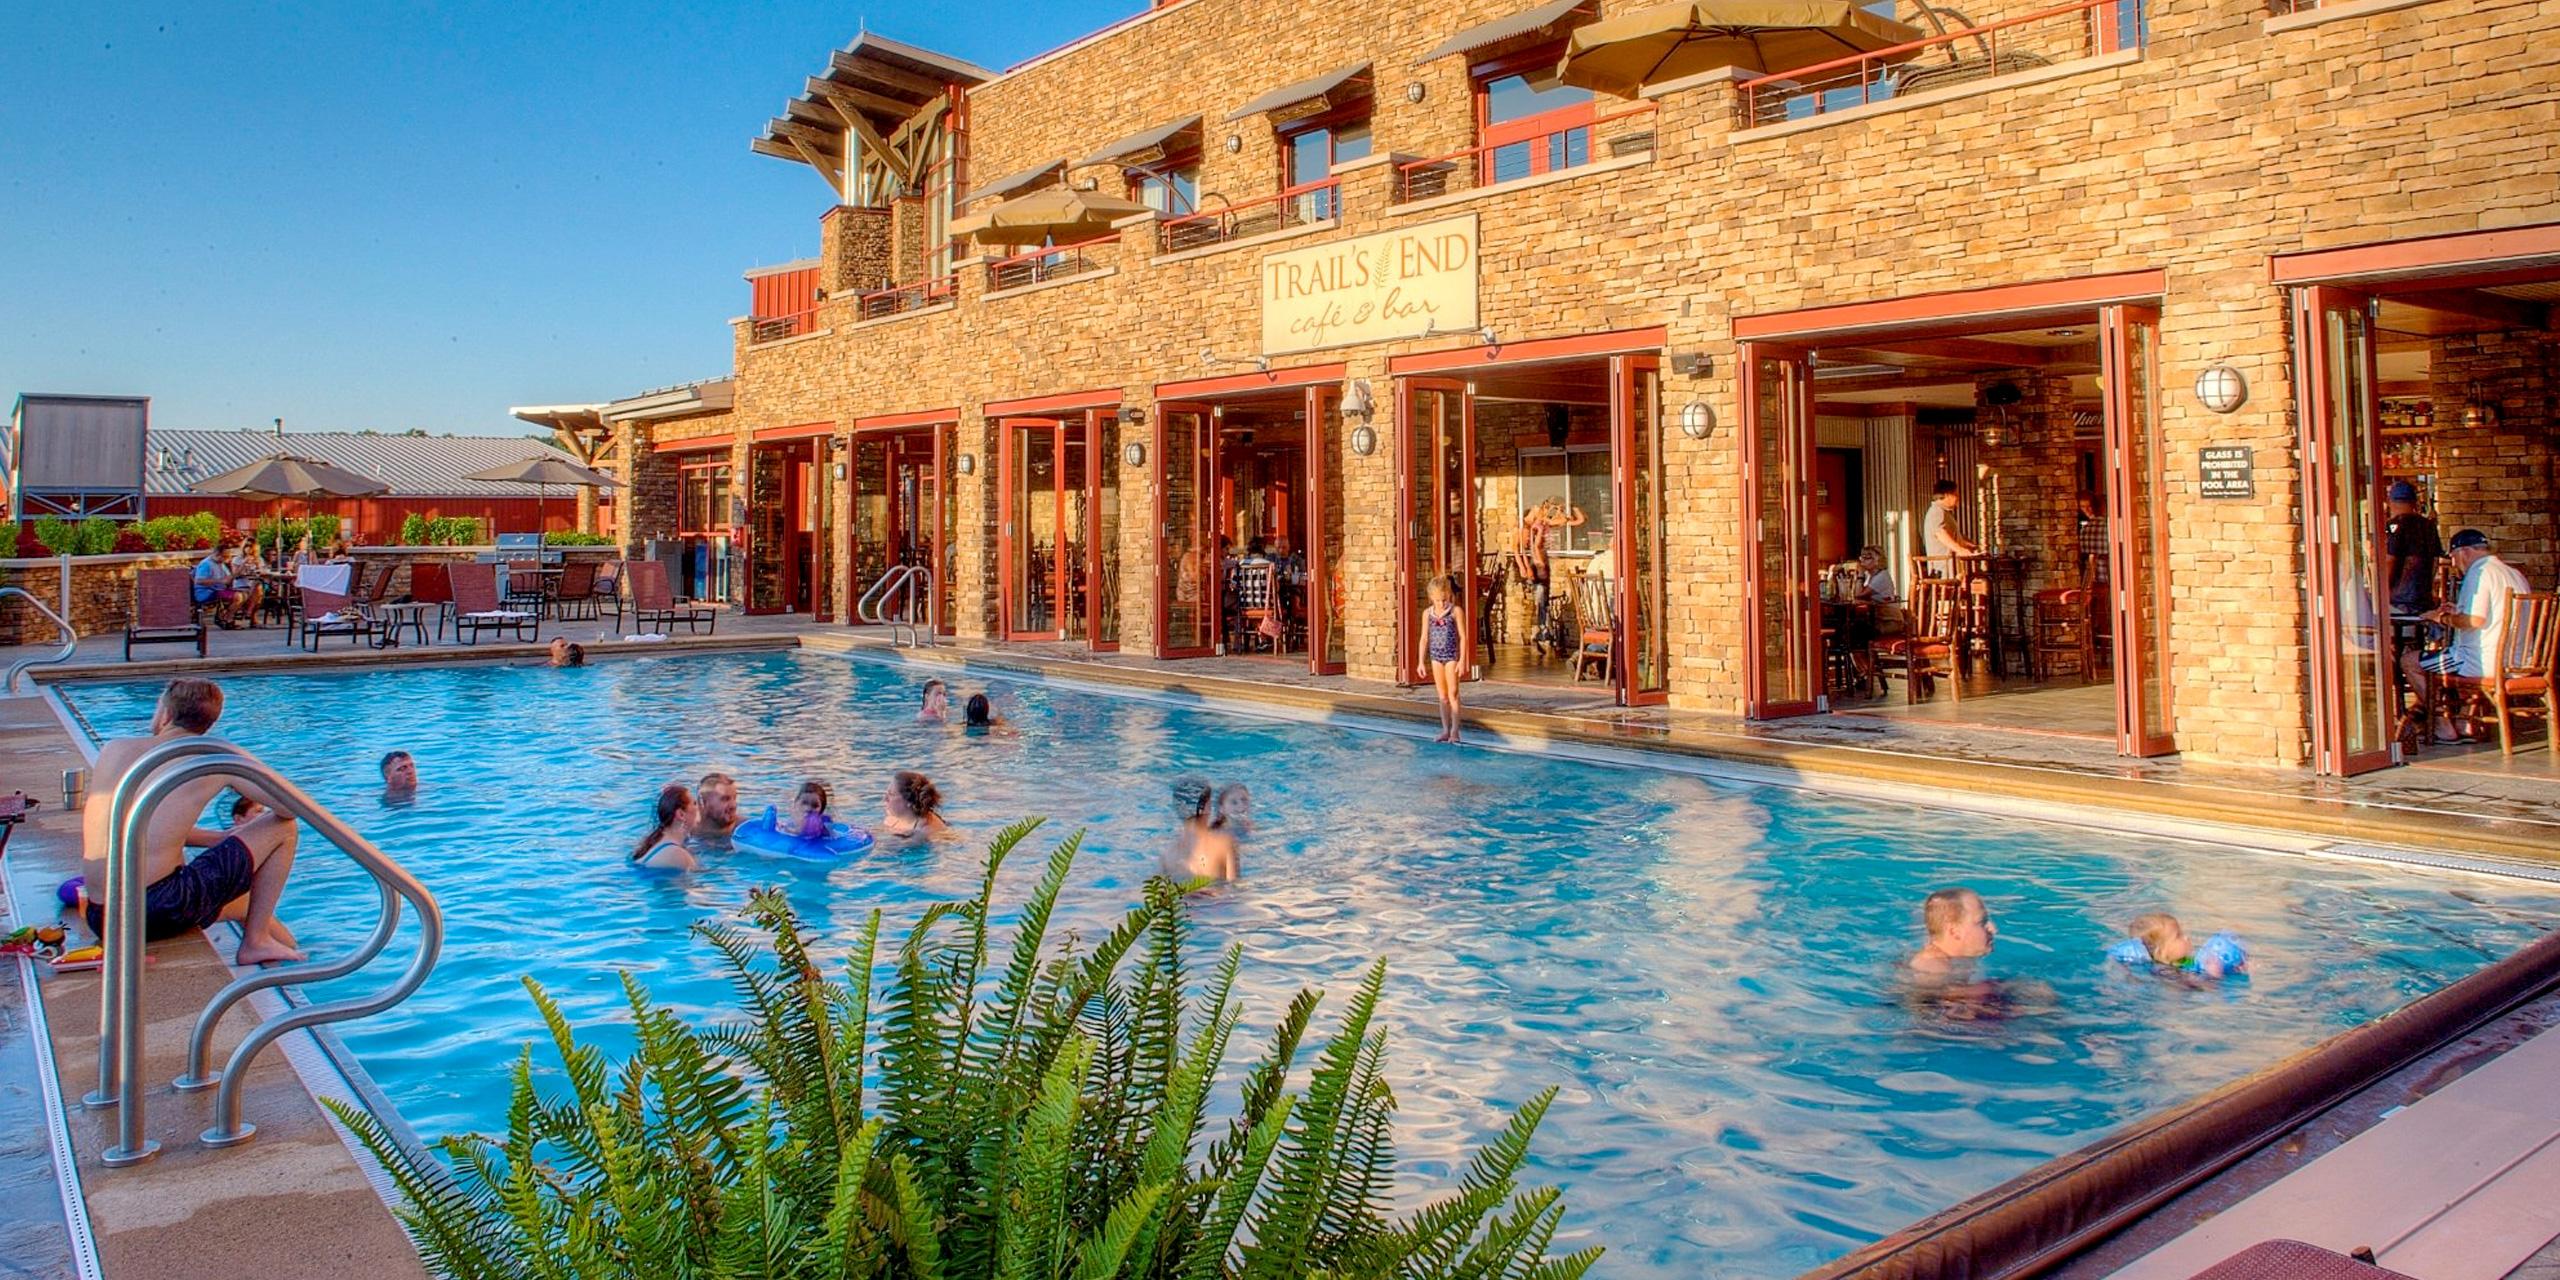 Bear Creek Mountain Resort - Macungie, PA; Courtesy of Bear Creek Mountain Resort